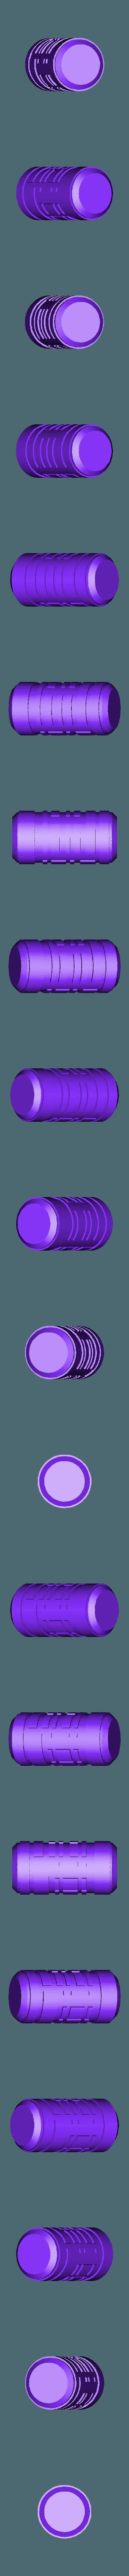 power_cell_2.stl Download free STL file ORCA communicator (Godzilla) • 3D printing object, poblocki1982